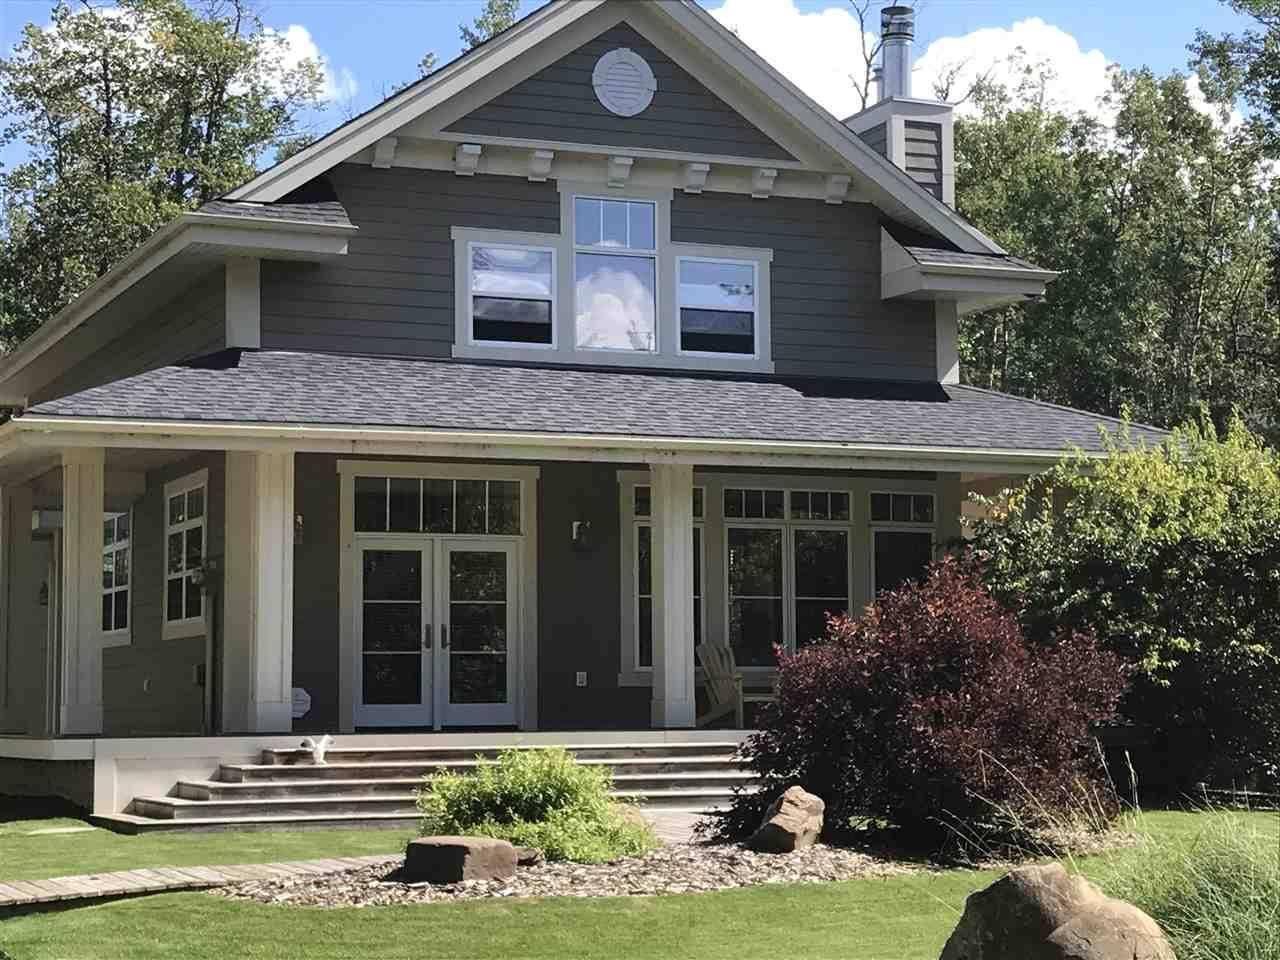 House for sale at 90 Silver Beach Rd Rural Wetaskiwin County Alberta - MLS: E4170493